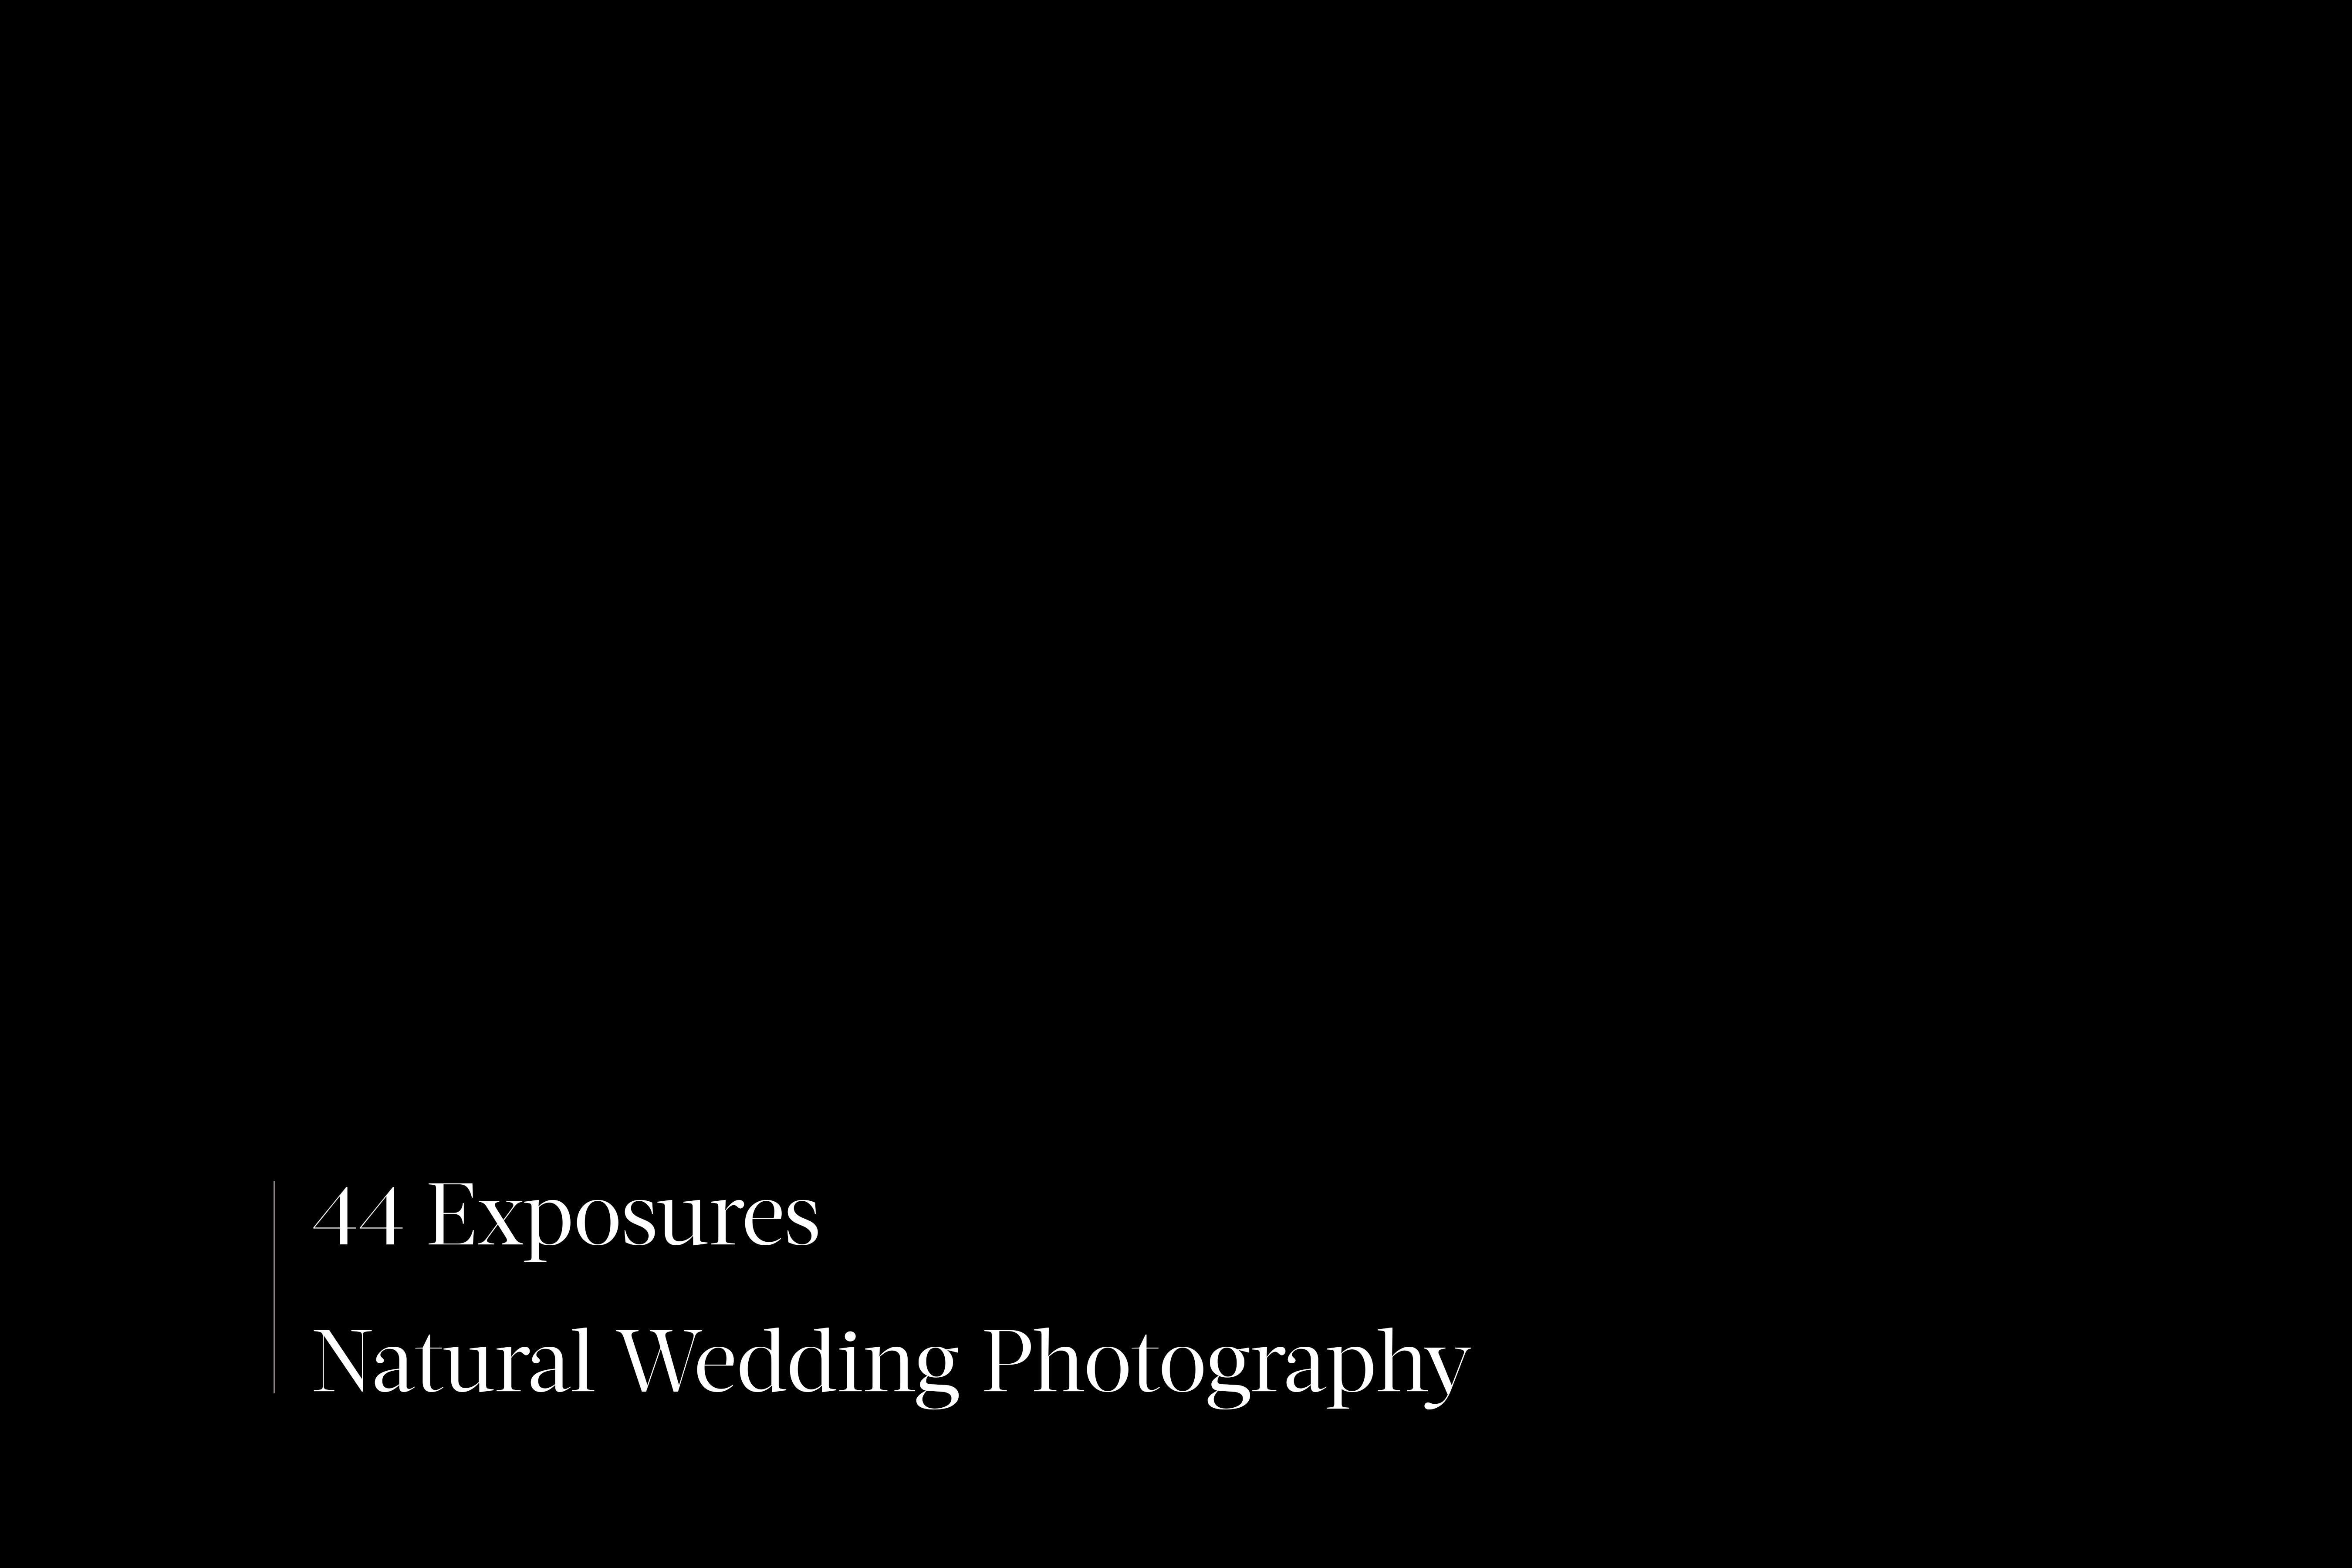 44_Exposures_Natural_Wedding_Photography